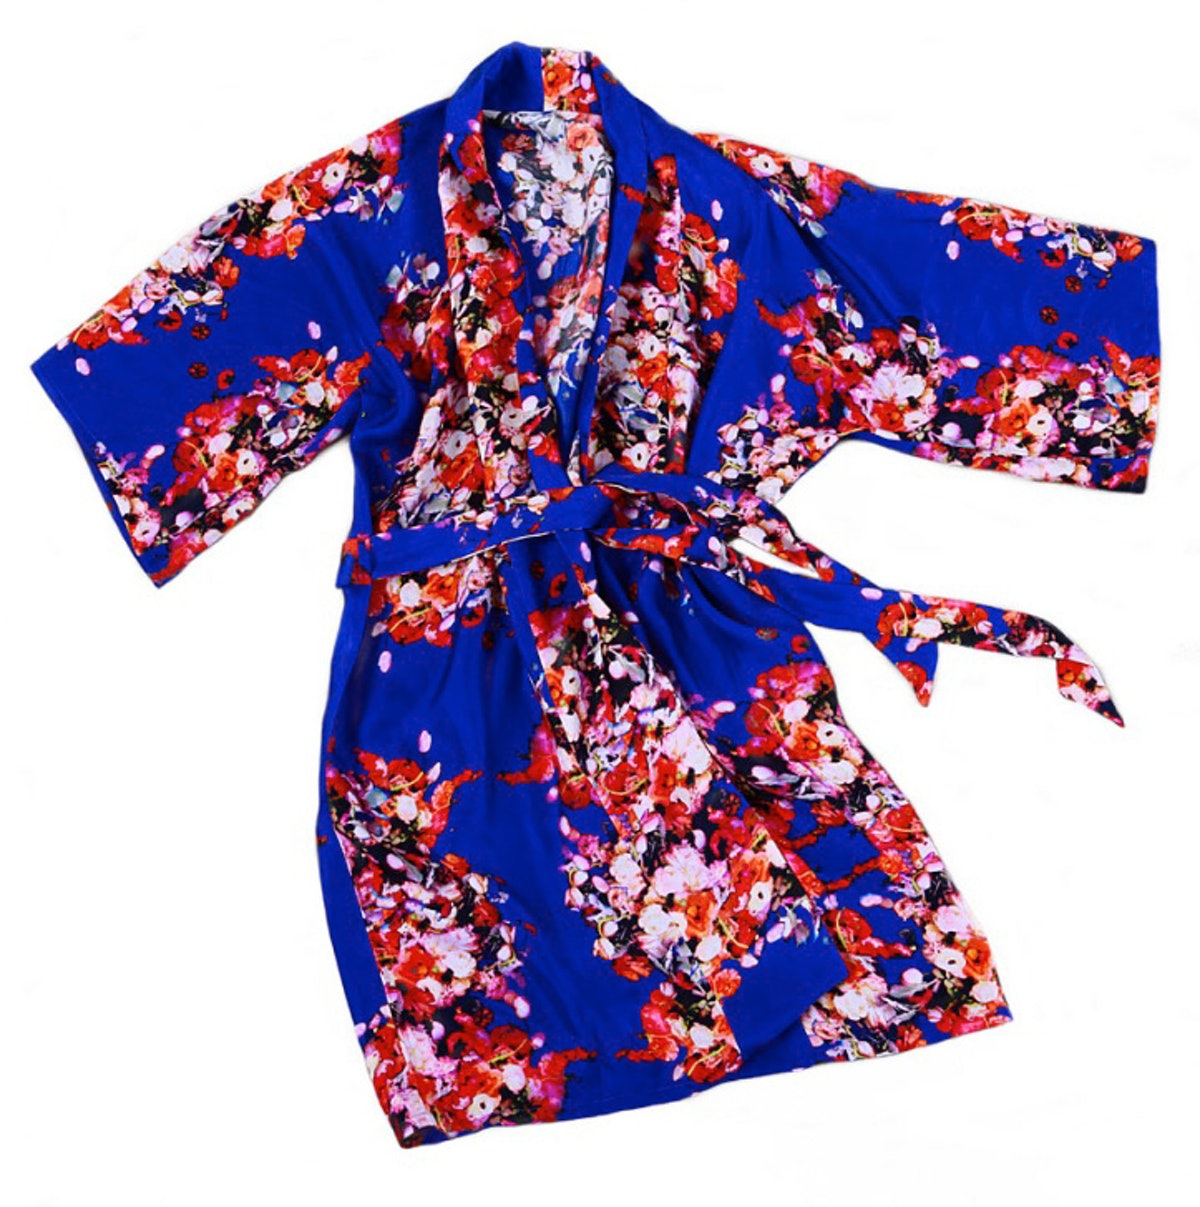 Stevie Howell kimono,